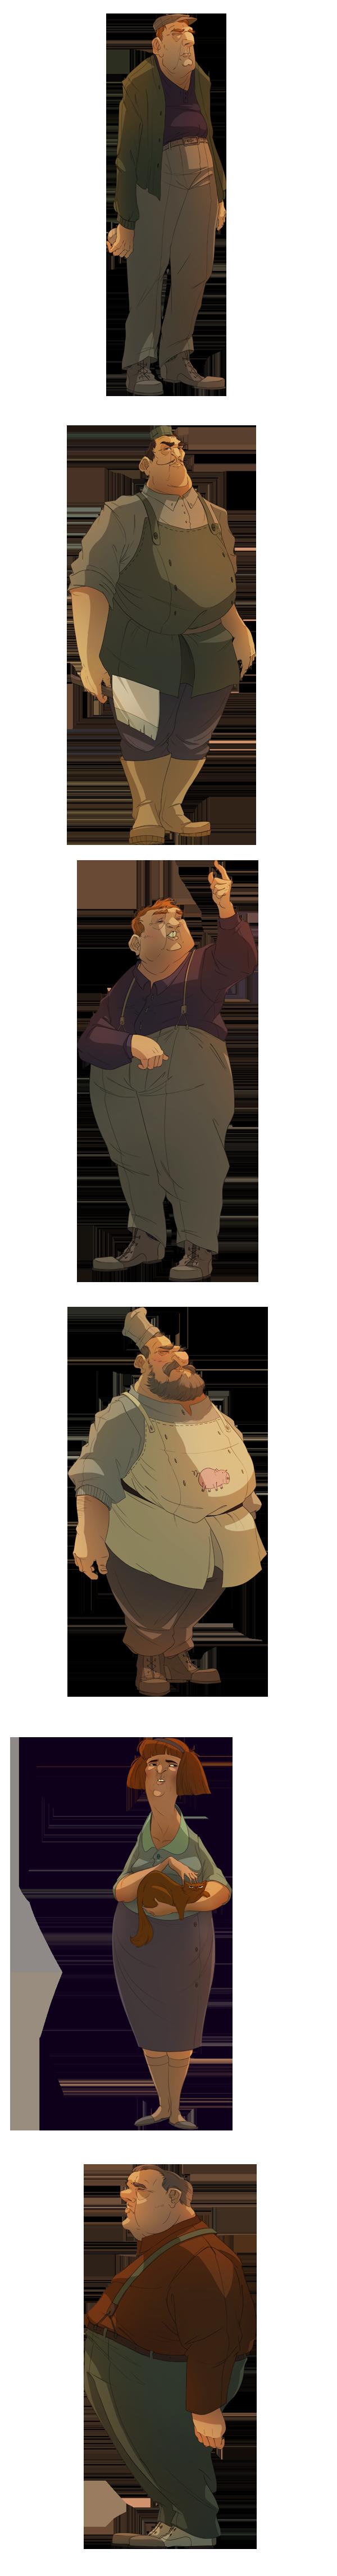 04_character_set2